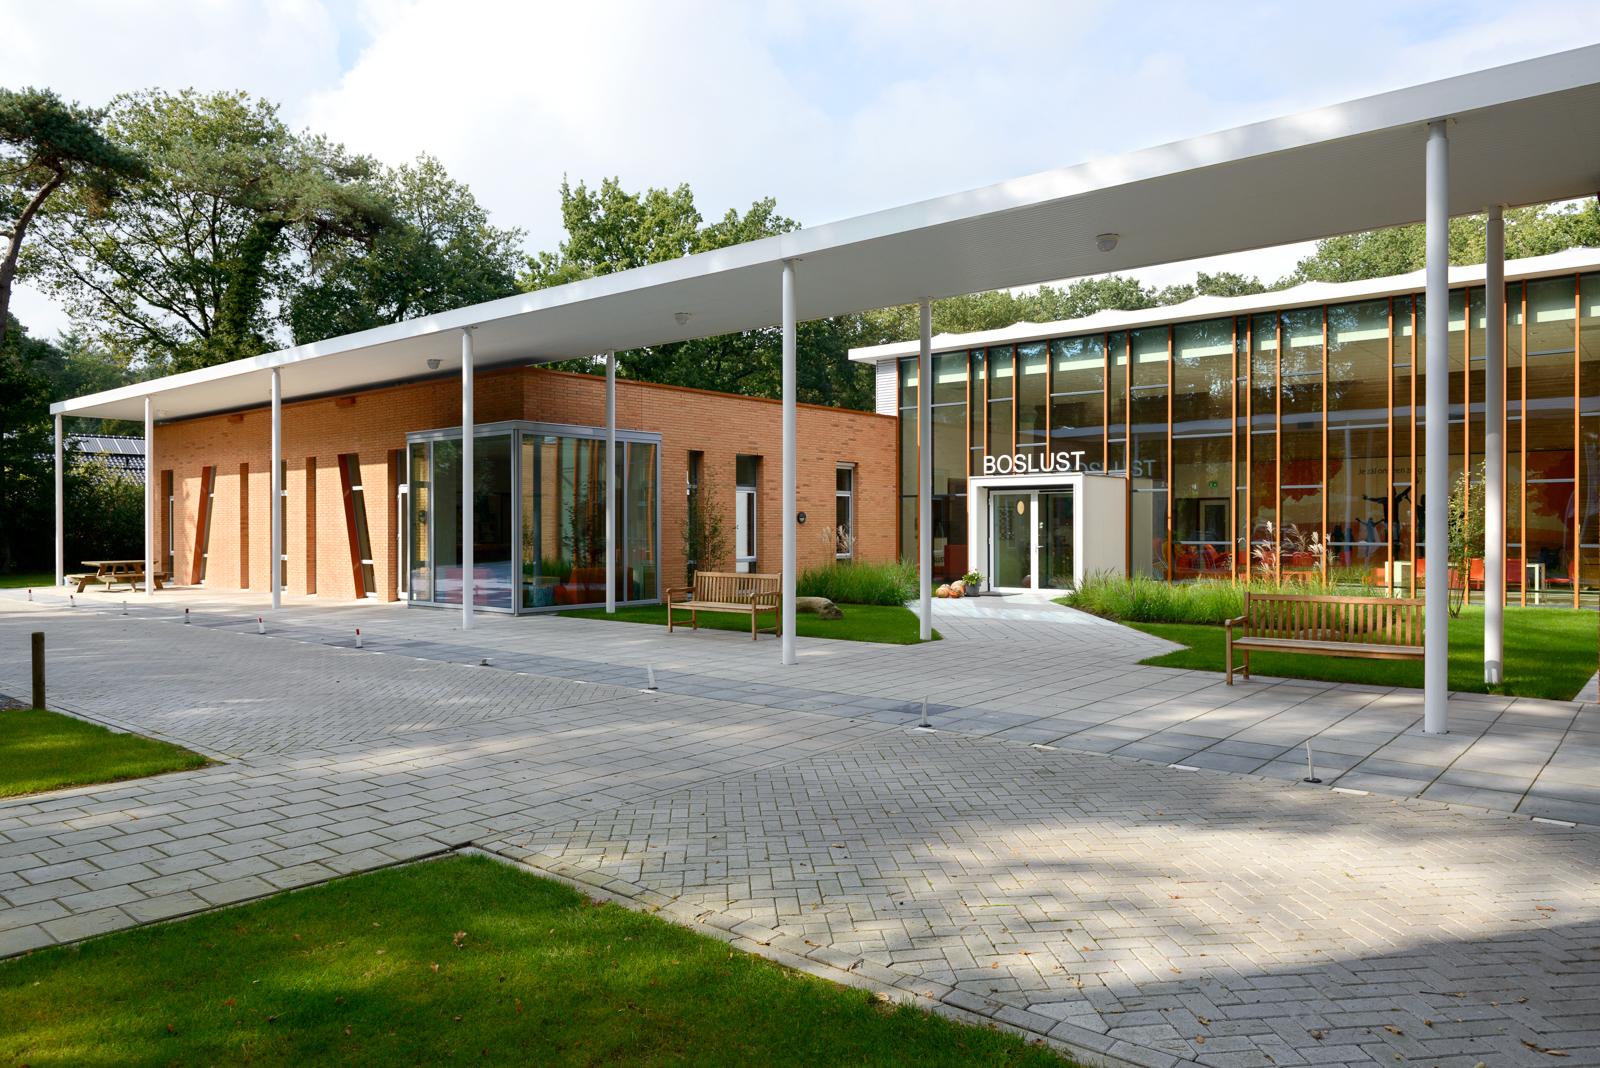 architectuurfotografie-architectuurfotograaf-Deventer-Overijssel-basisschool-Ommen-Kristinsson-Daan-Josee